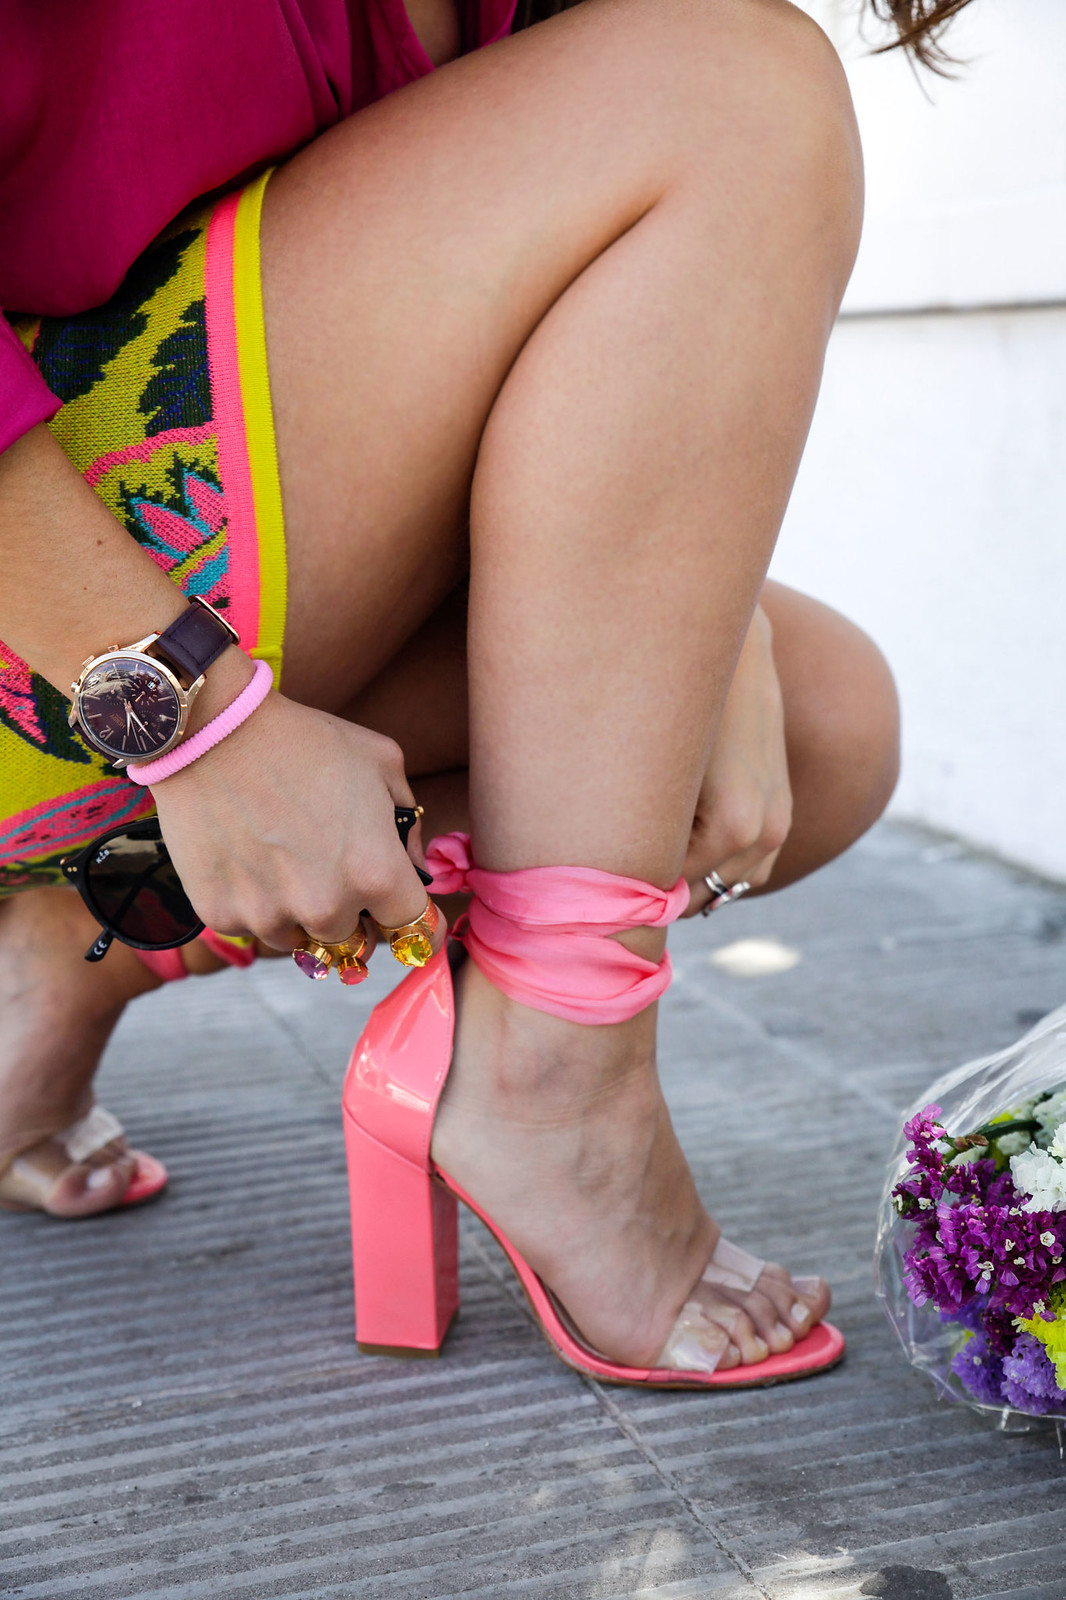 011_blusa_magenta_falda_amarilla_outfit_ruga_summer17_theguestgirl_influencer_barcelona_portugal_brand_ambassador